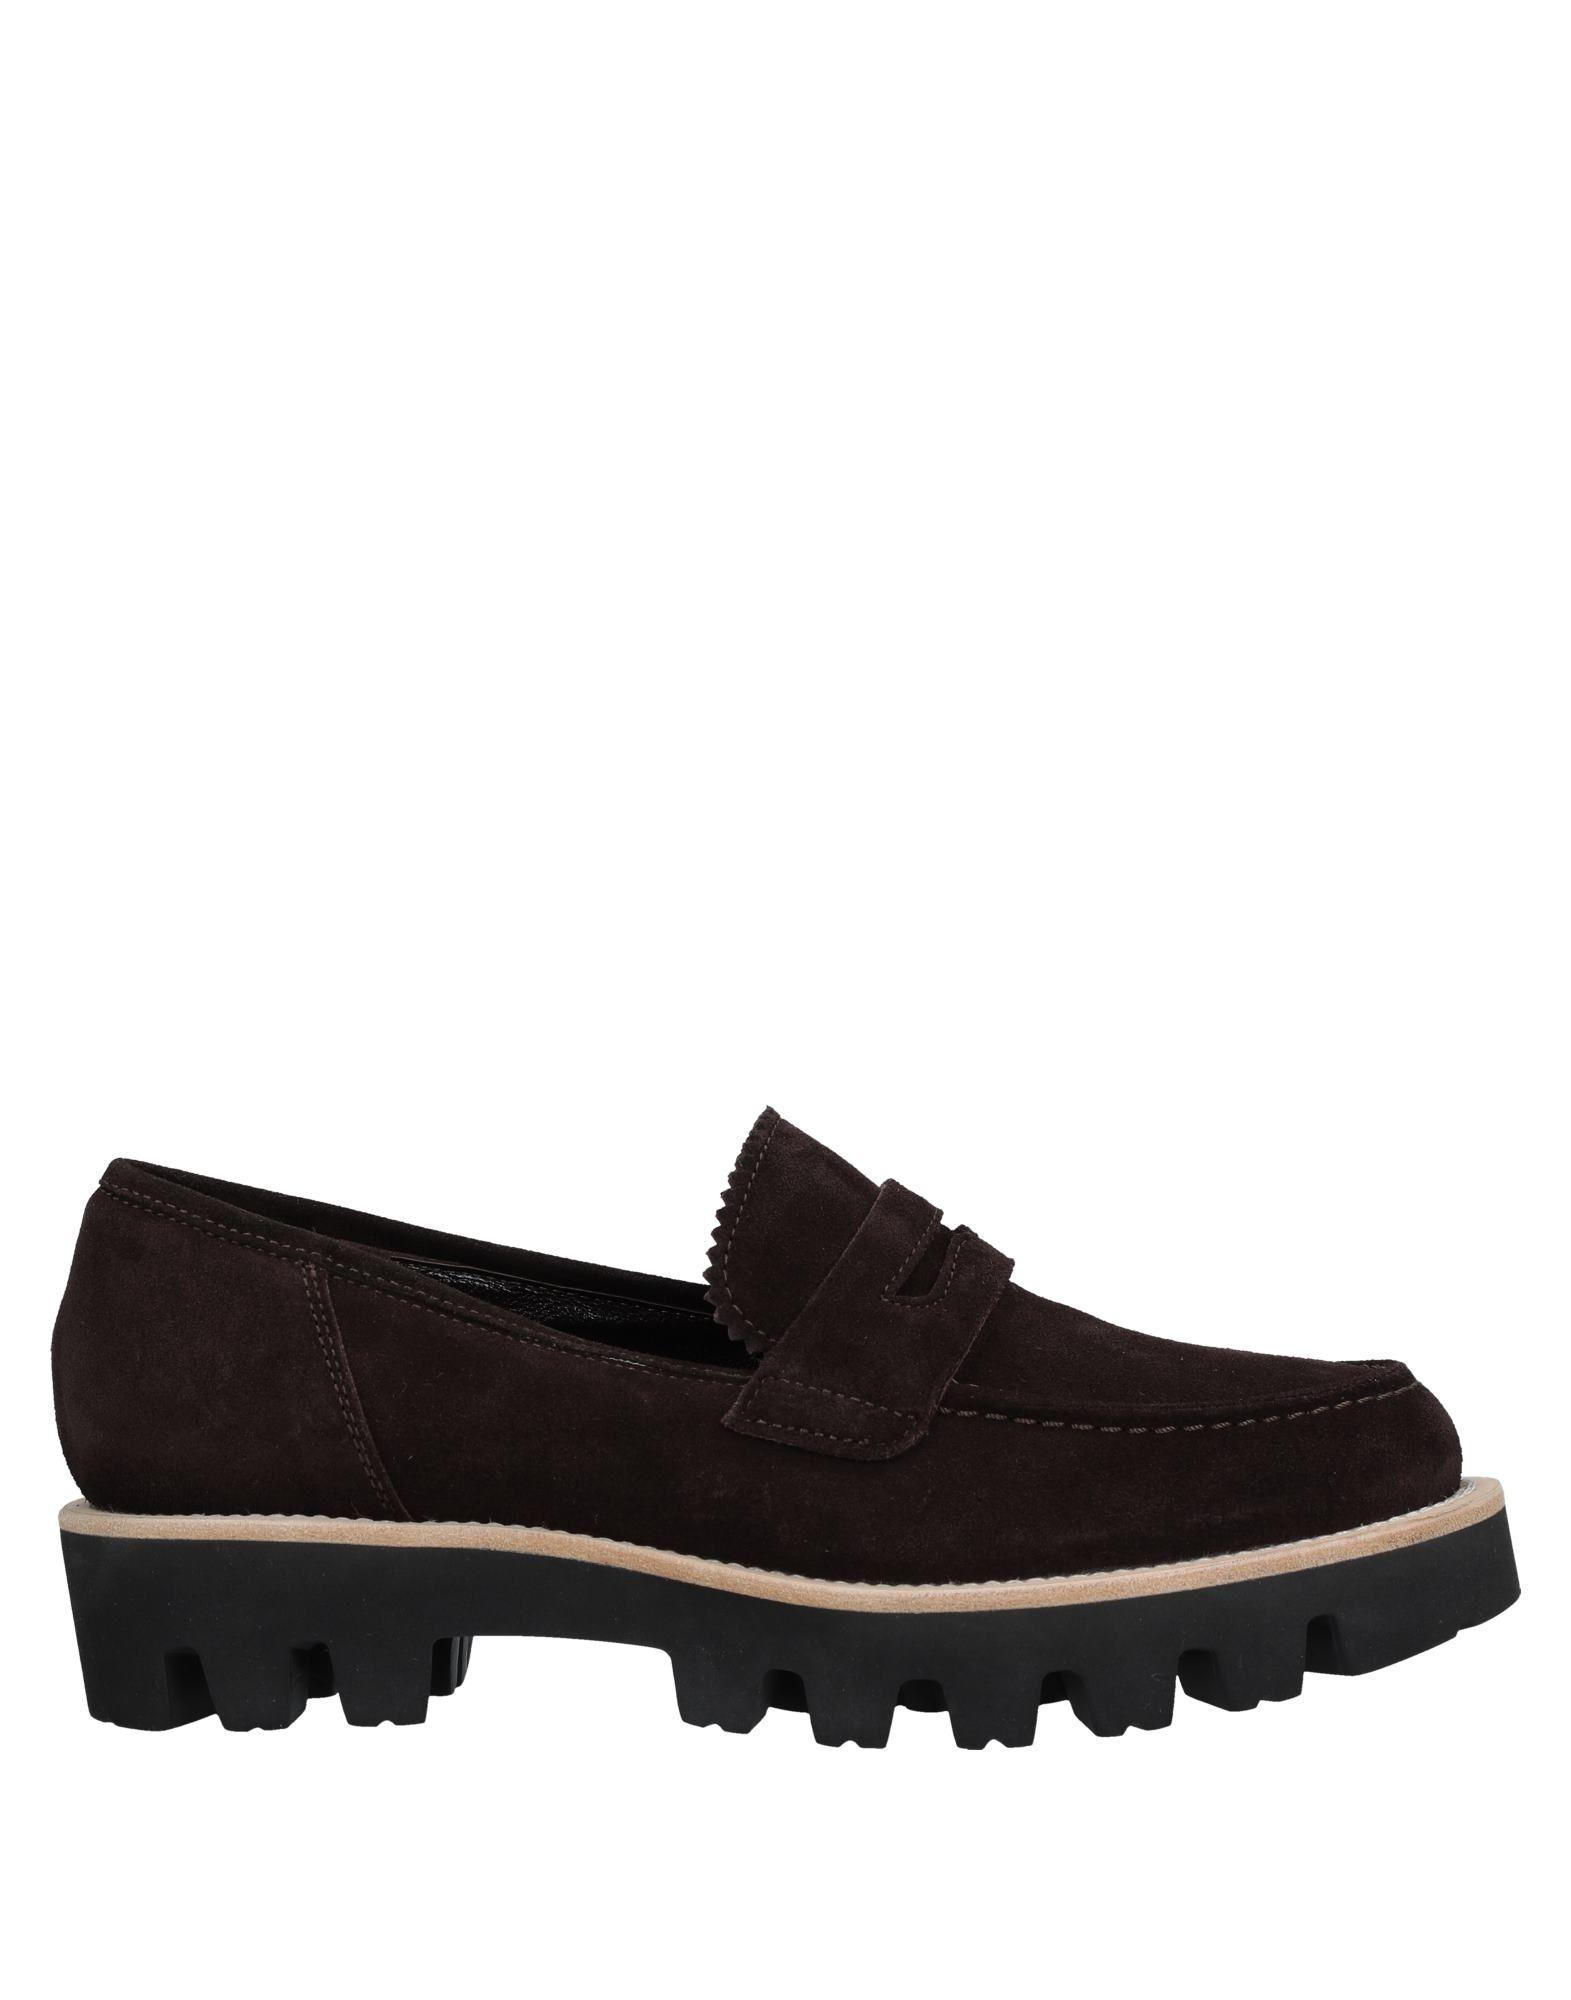 F.Lli Bruglia Mokassins Damen  11525527GPGut aussehende strapazierfähige Schuhe